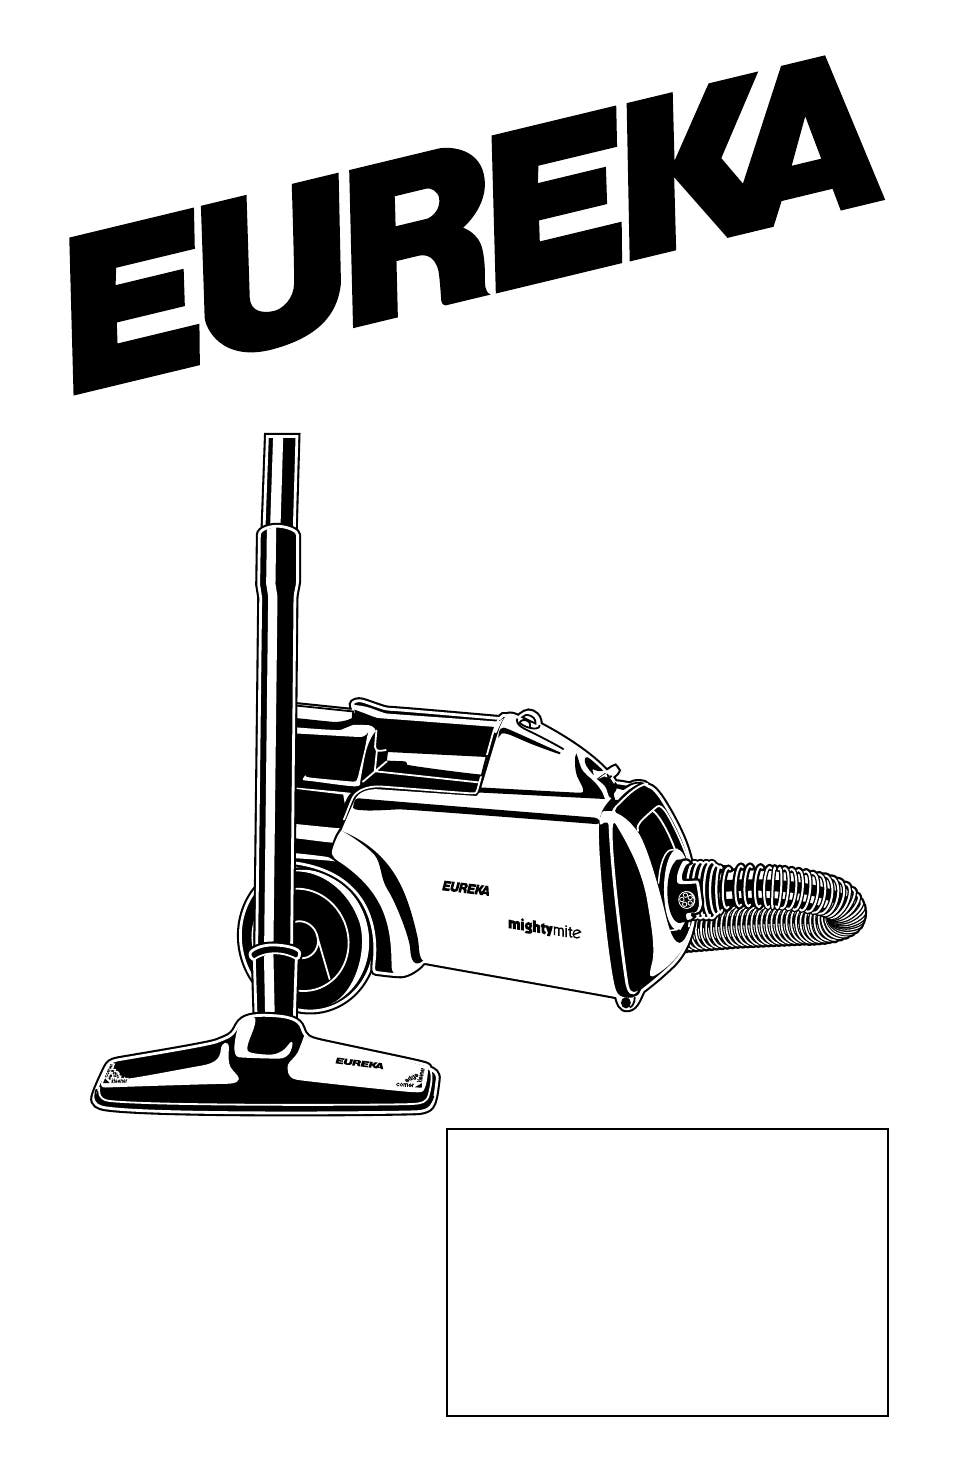 Eureka Canisters 3695A